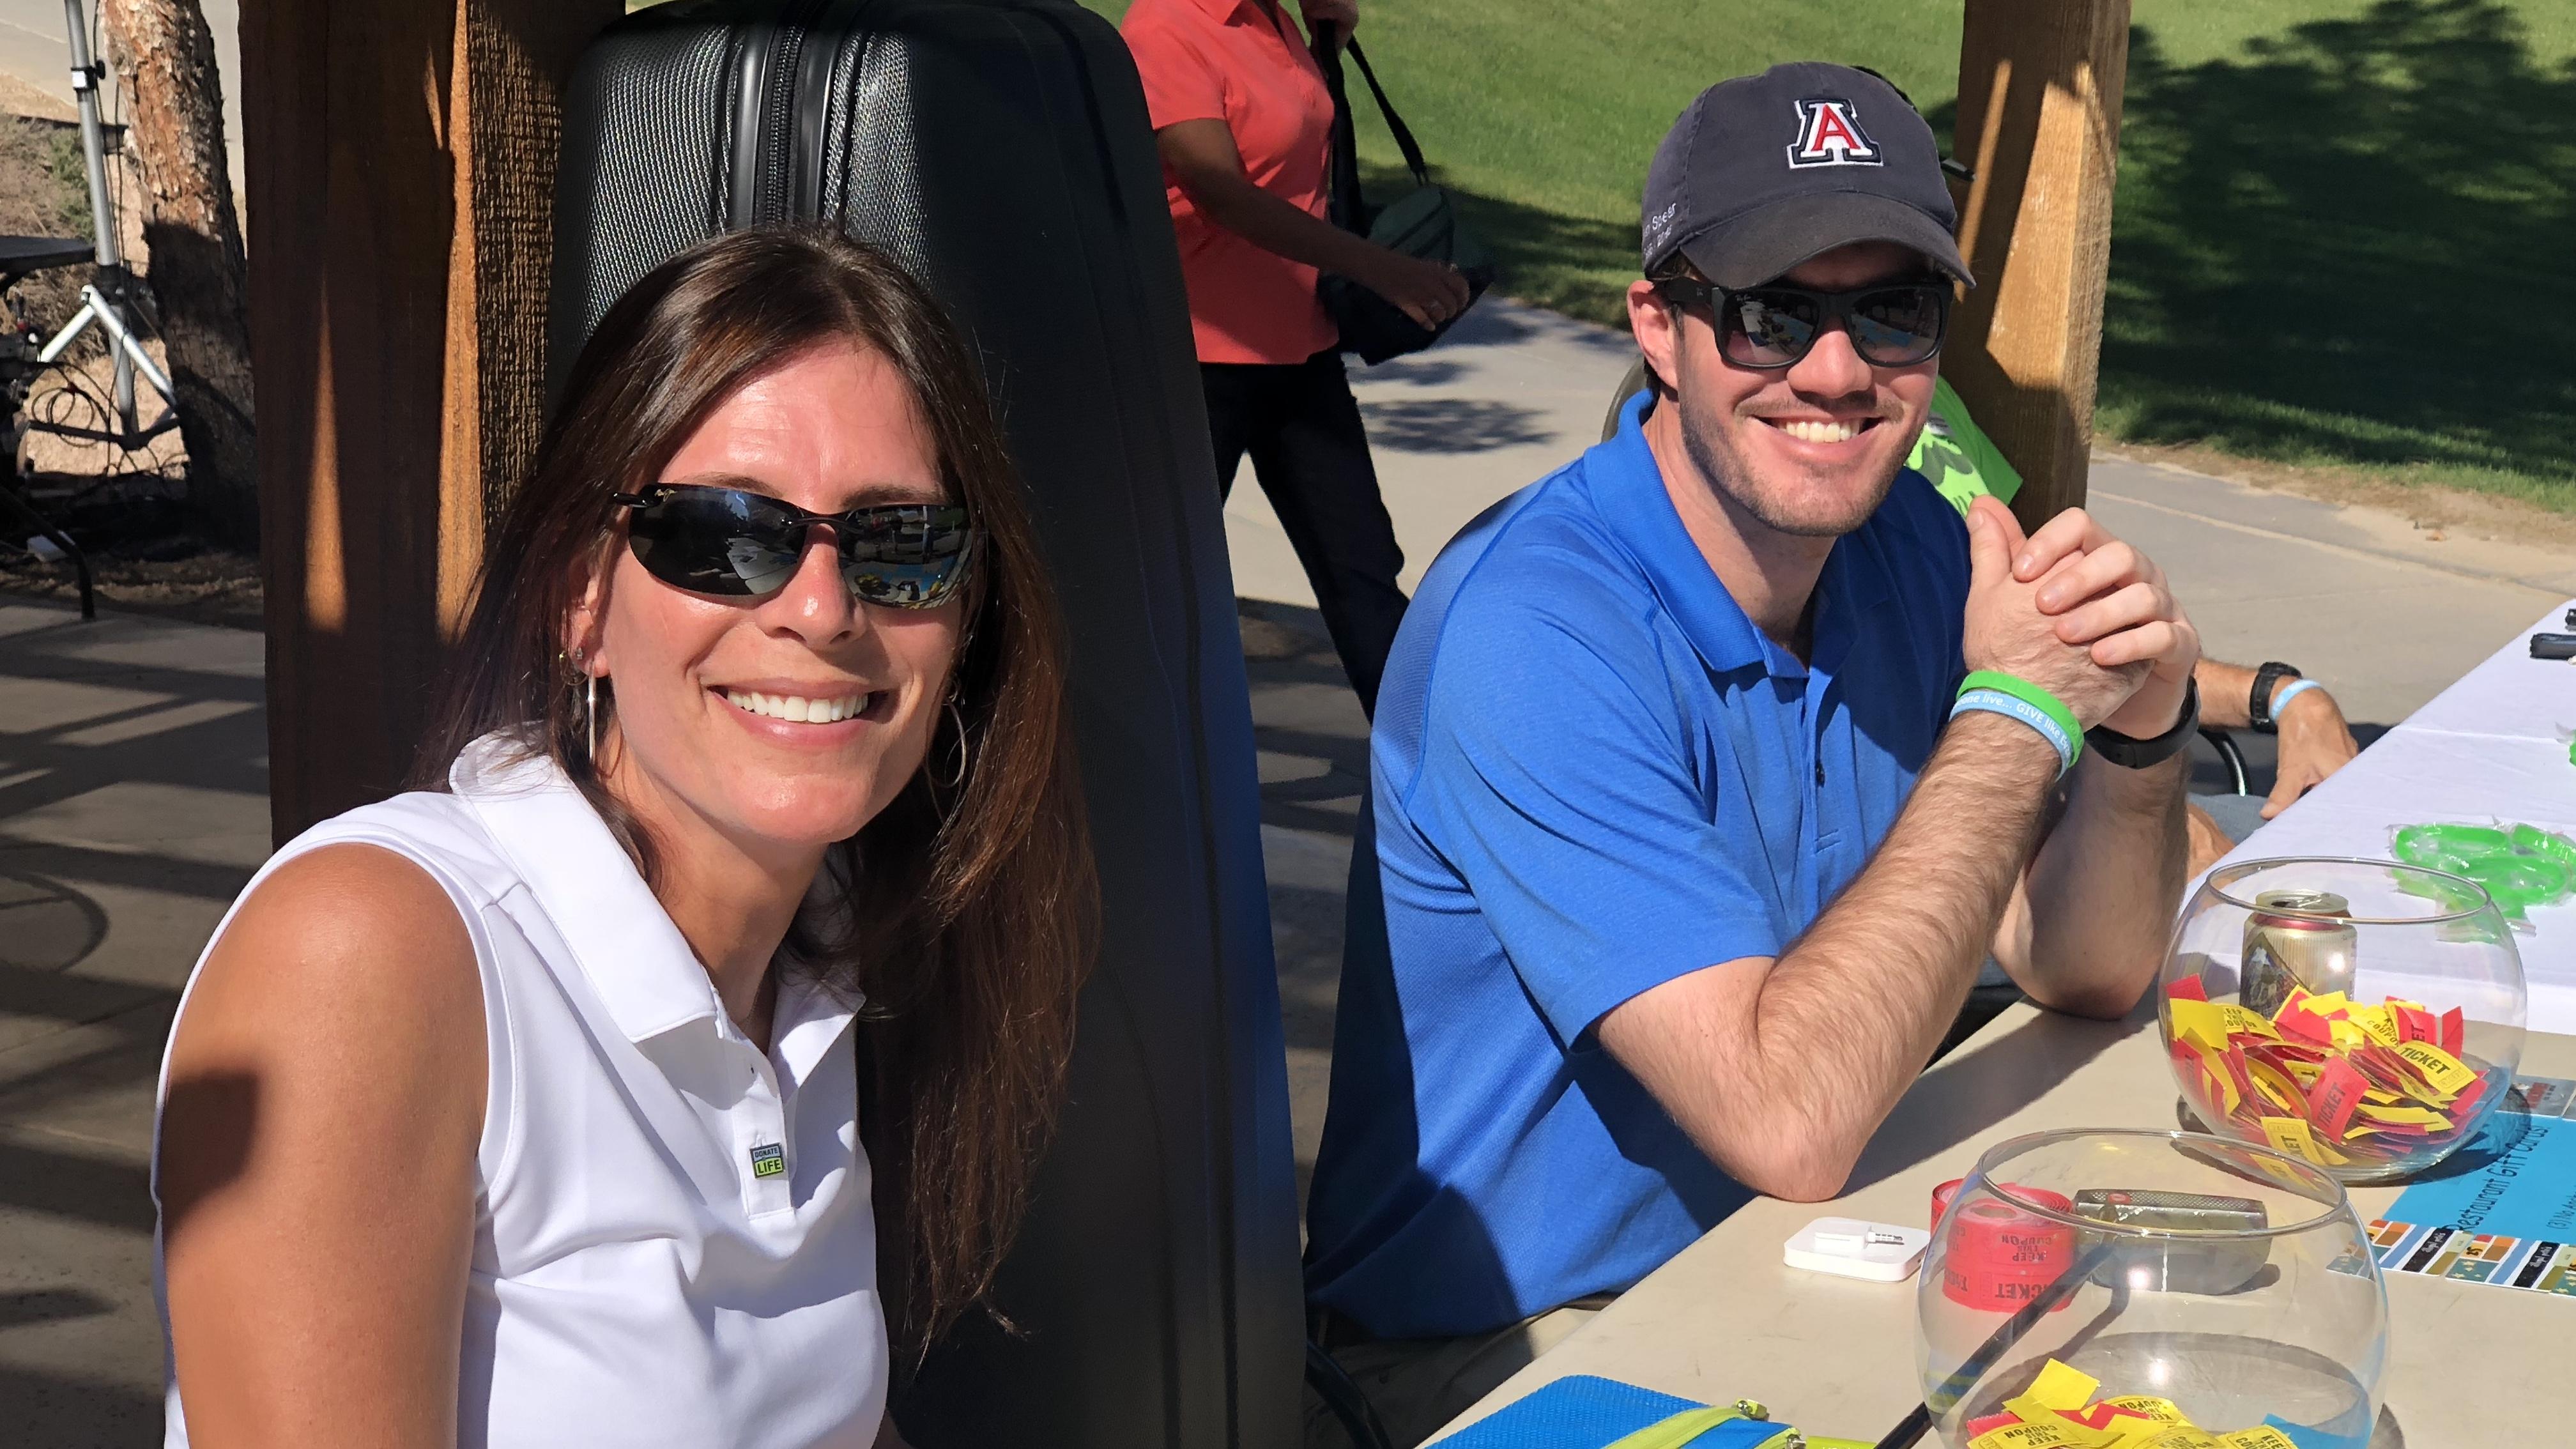 KA - Evan Spear Memorial Golf Tournament gallery image #11